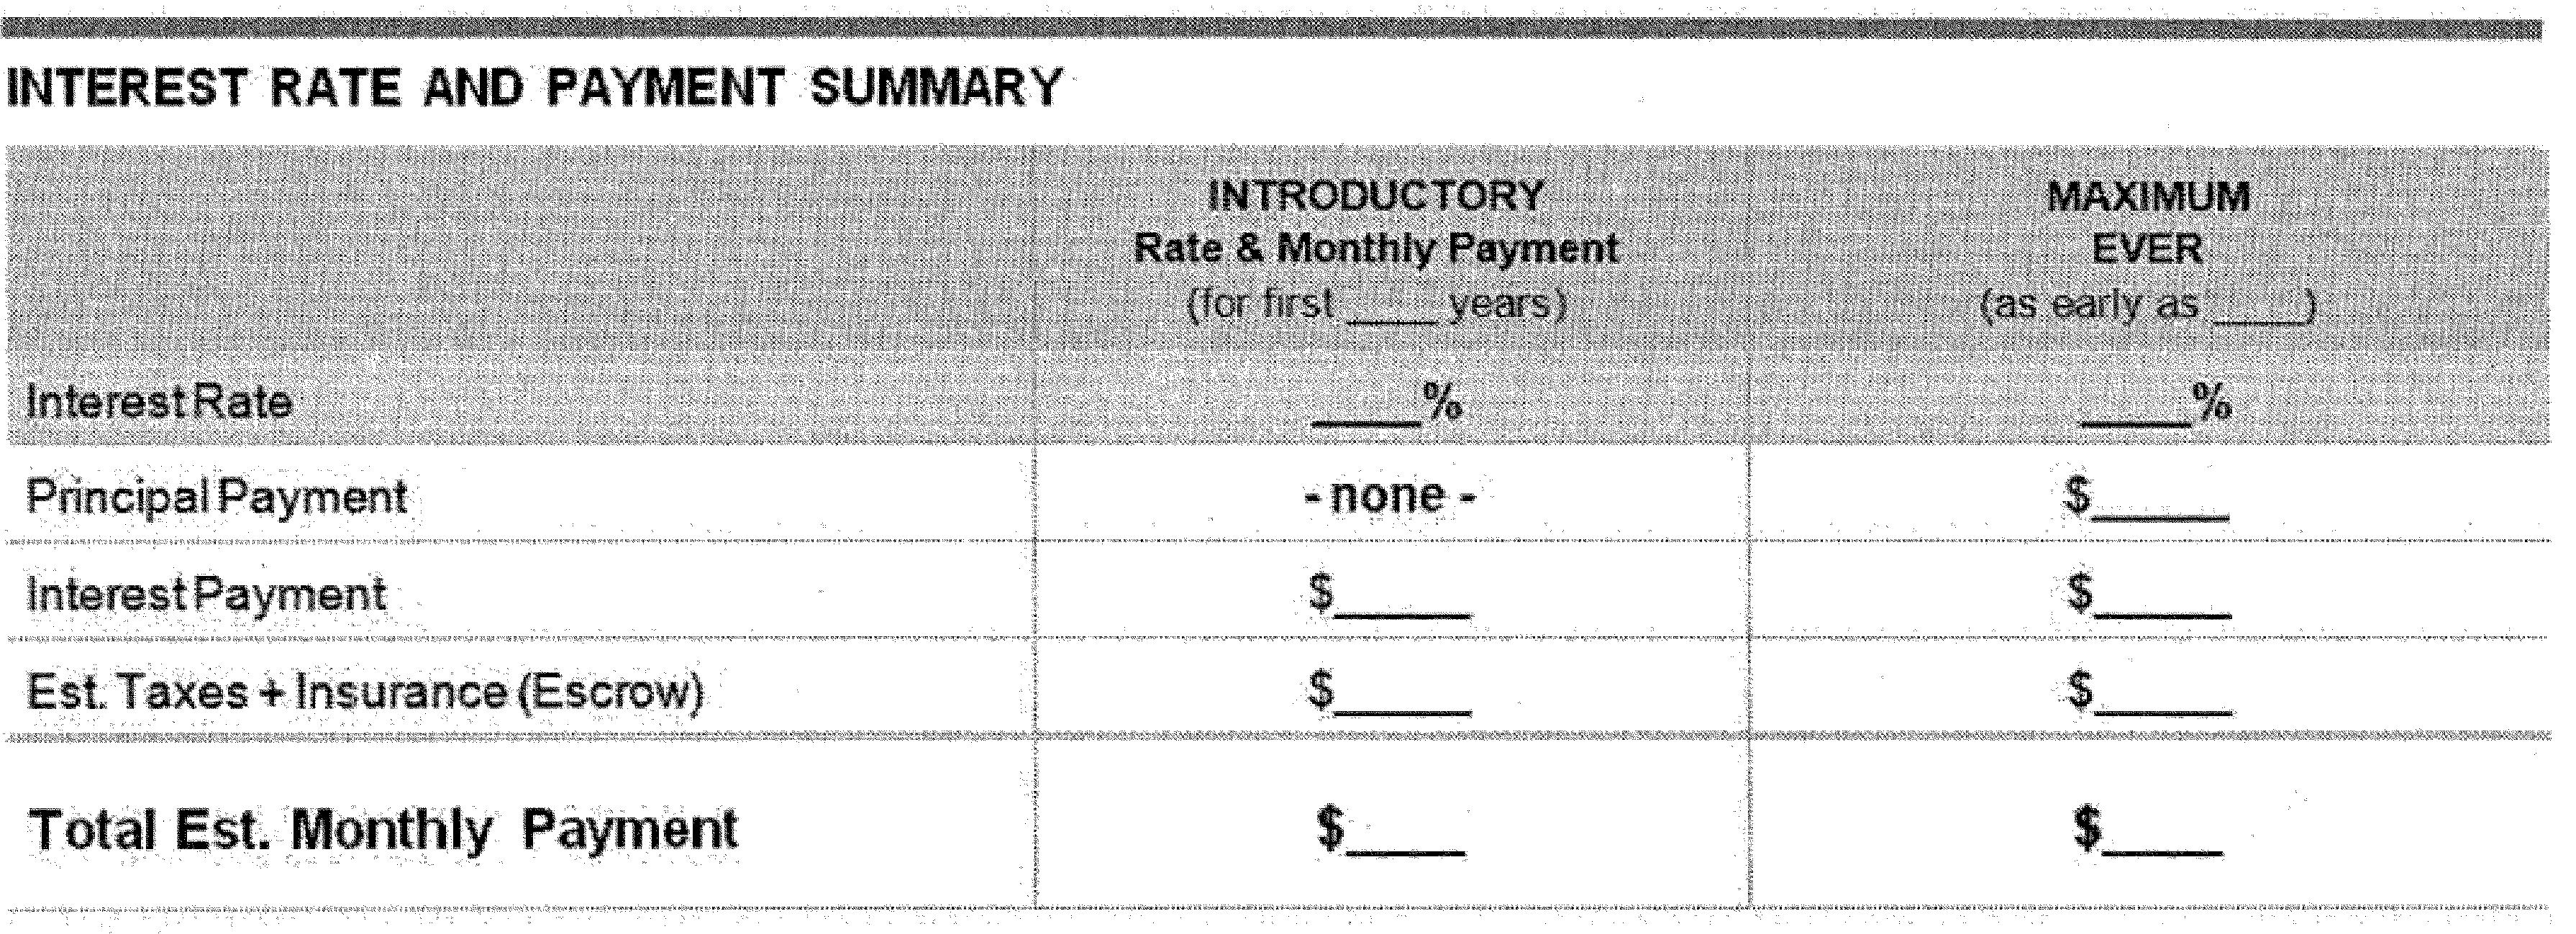 image-H-4-H